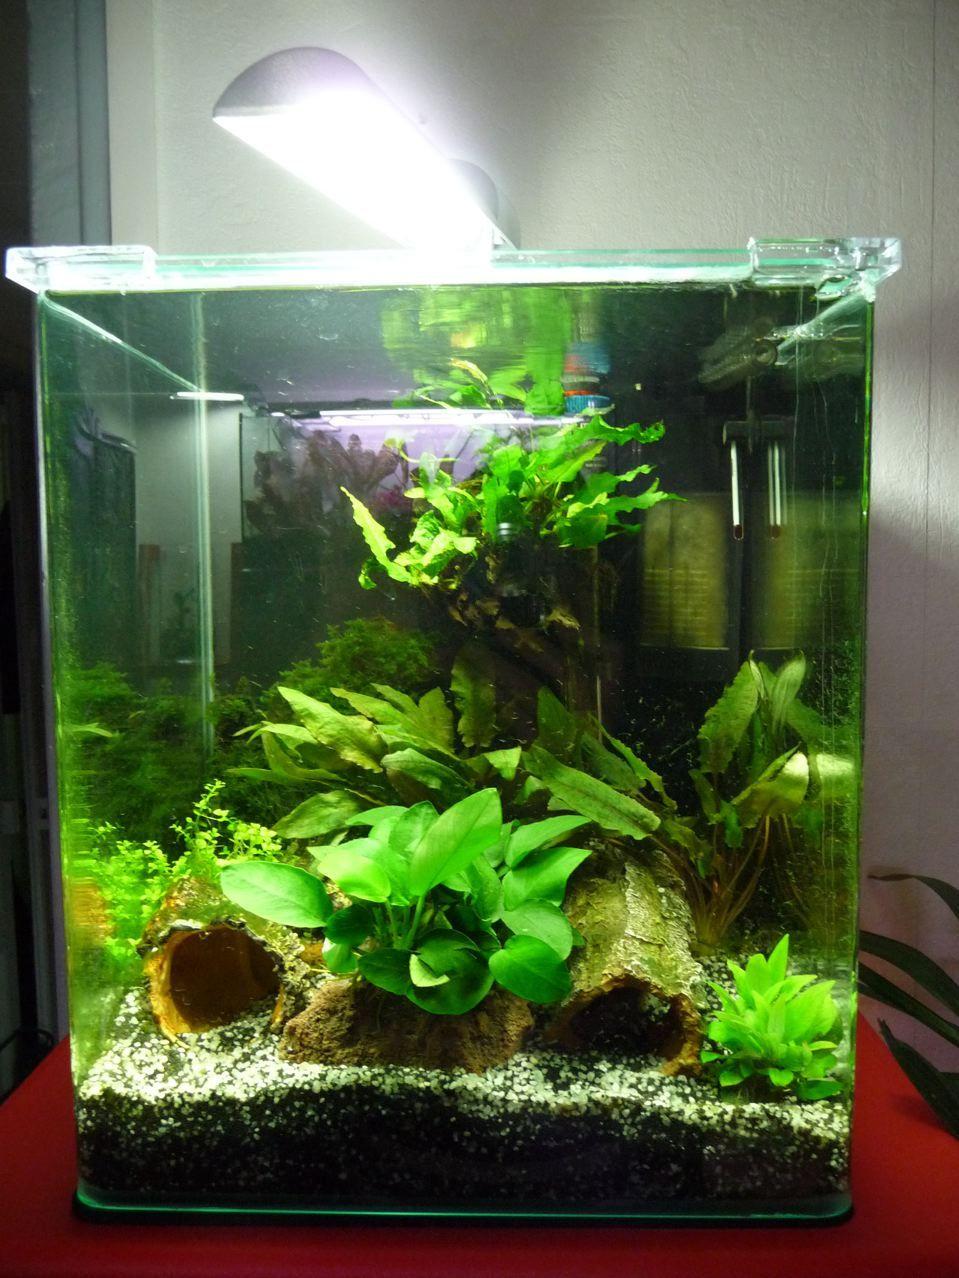 Extremely dennerle aquarium | Aquarium nano cube 30 litres, Dennerle, 19  BE73